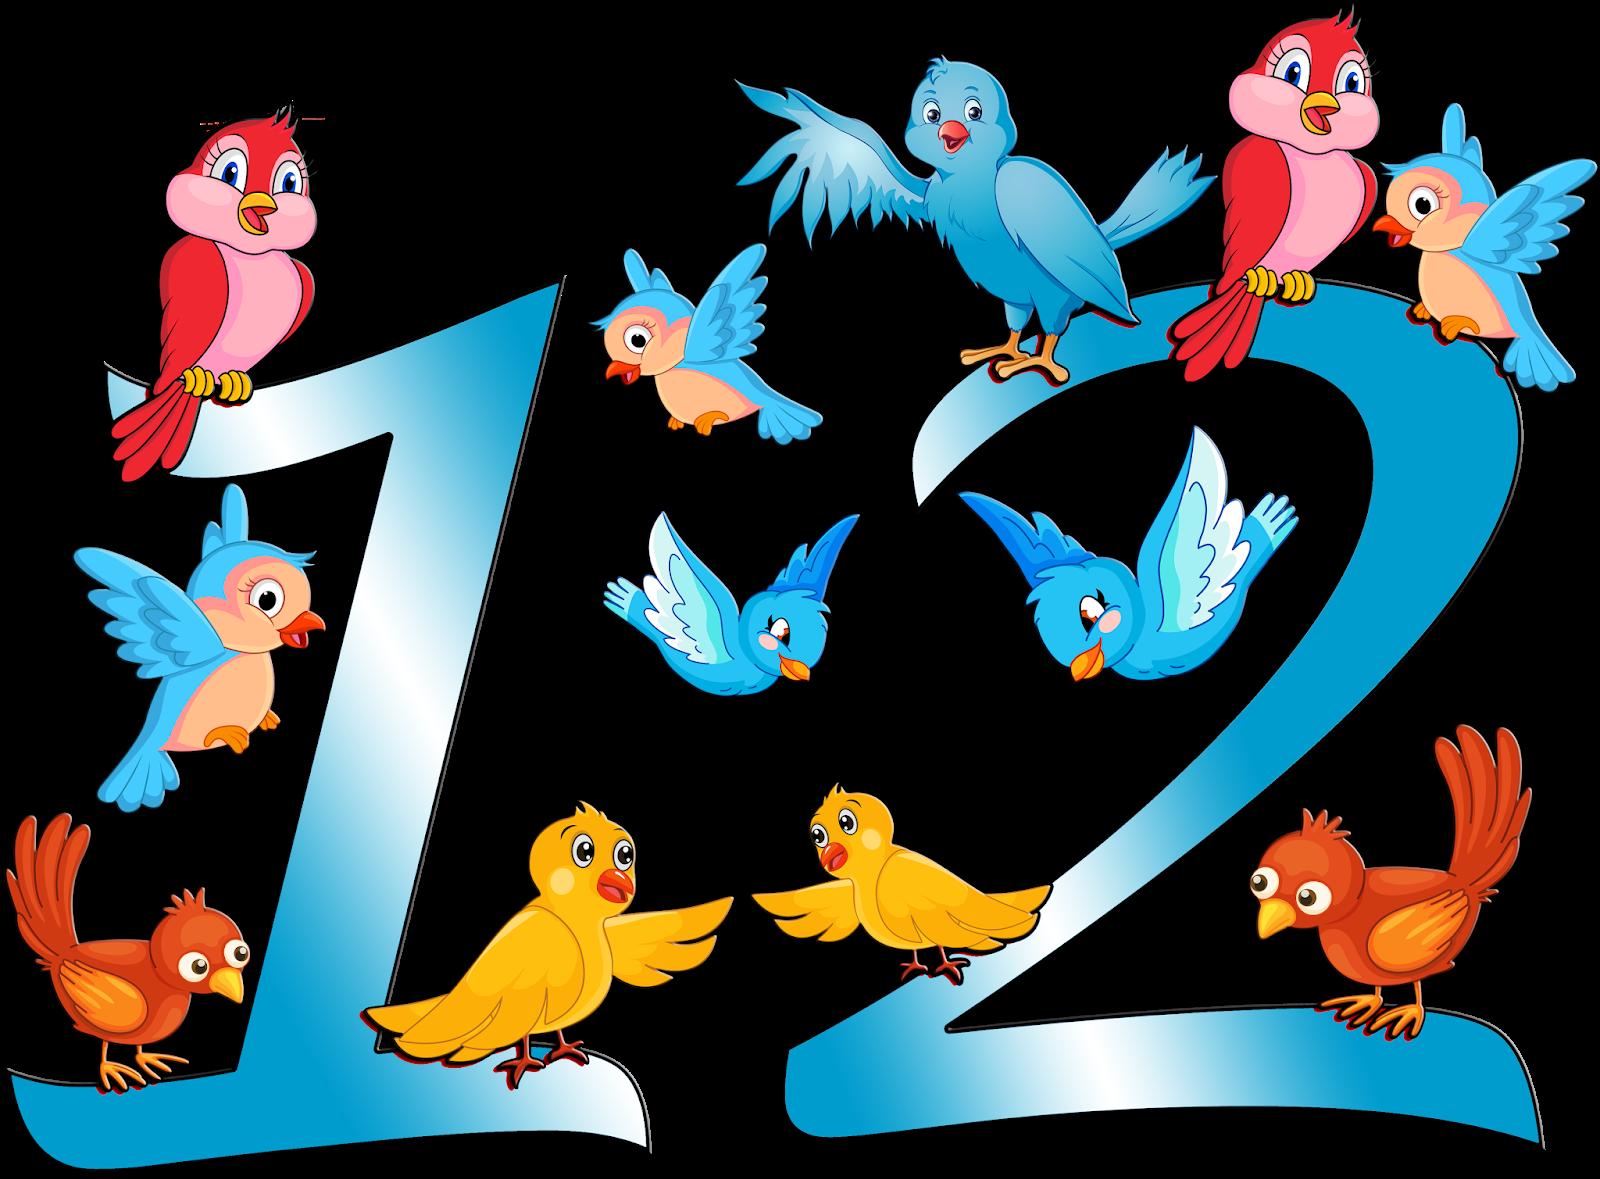 الأرقام والأعداد للأطفال مدرستي نور حياتي Disney Characters Character Fictional Characters